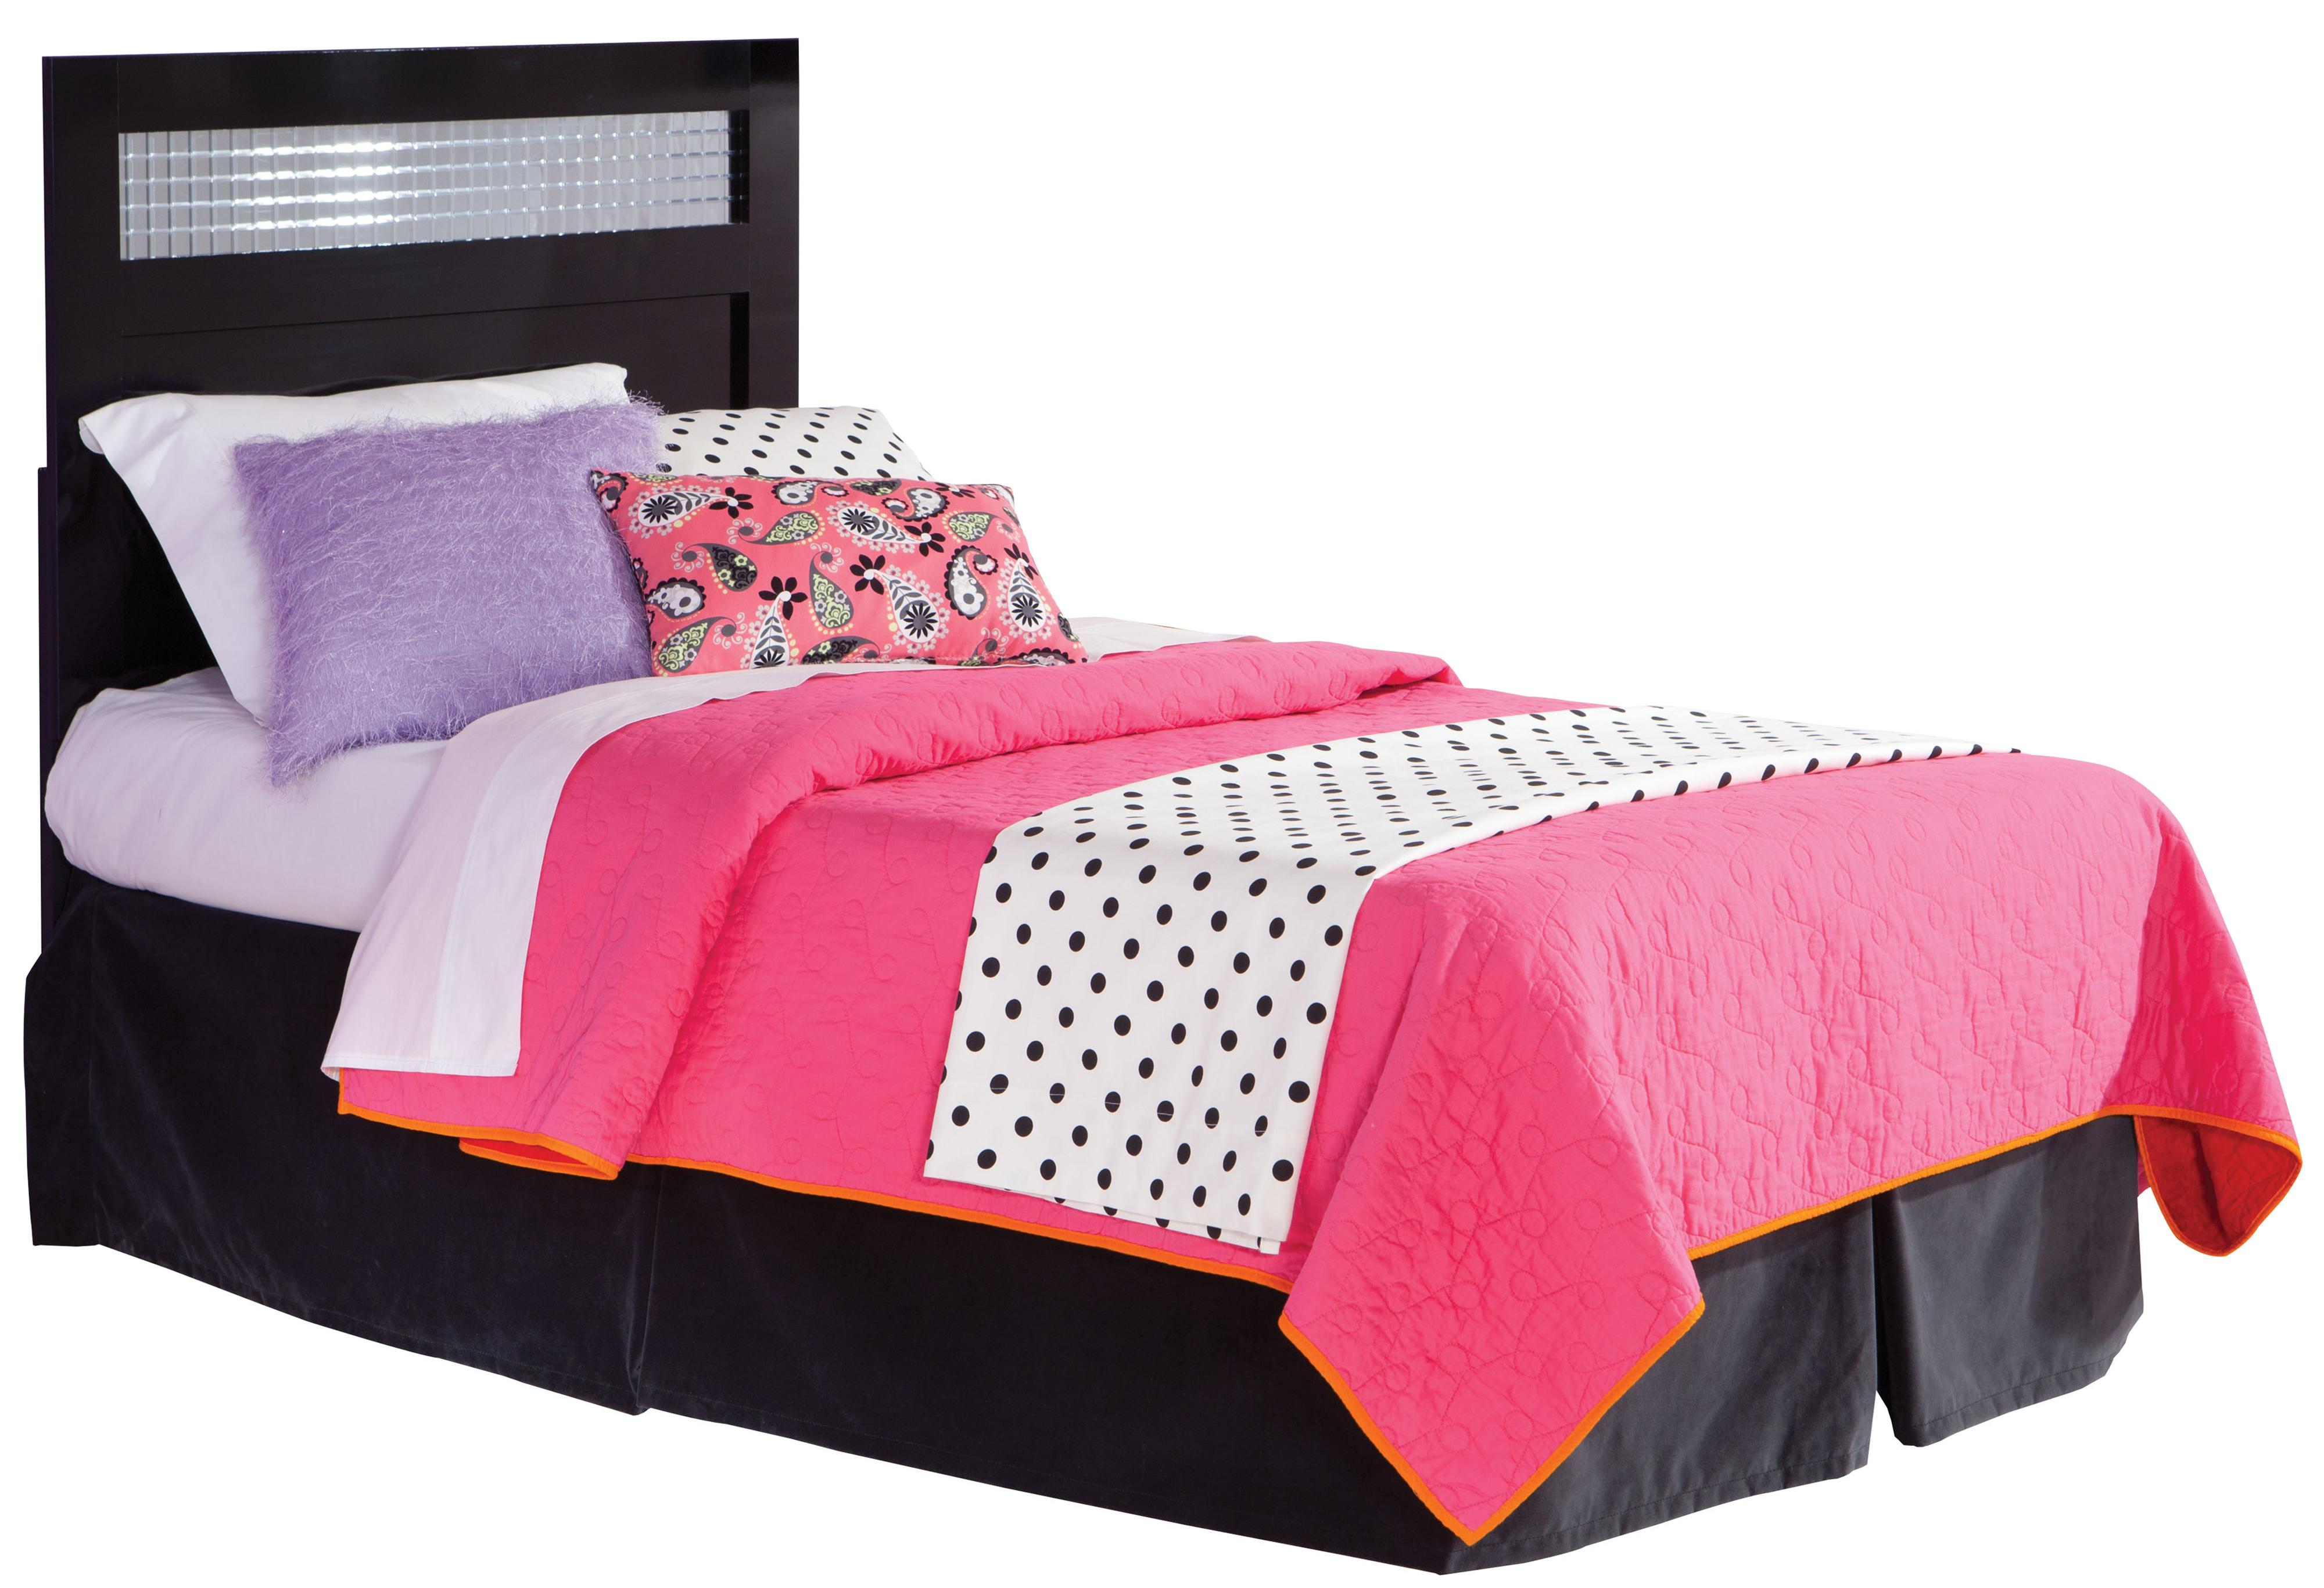 Standard Furniture Marilyn Youth Twin Headboard - Item Number: 67303